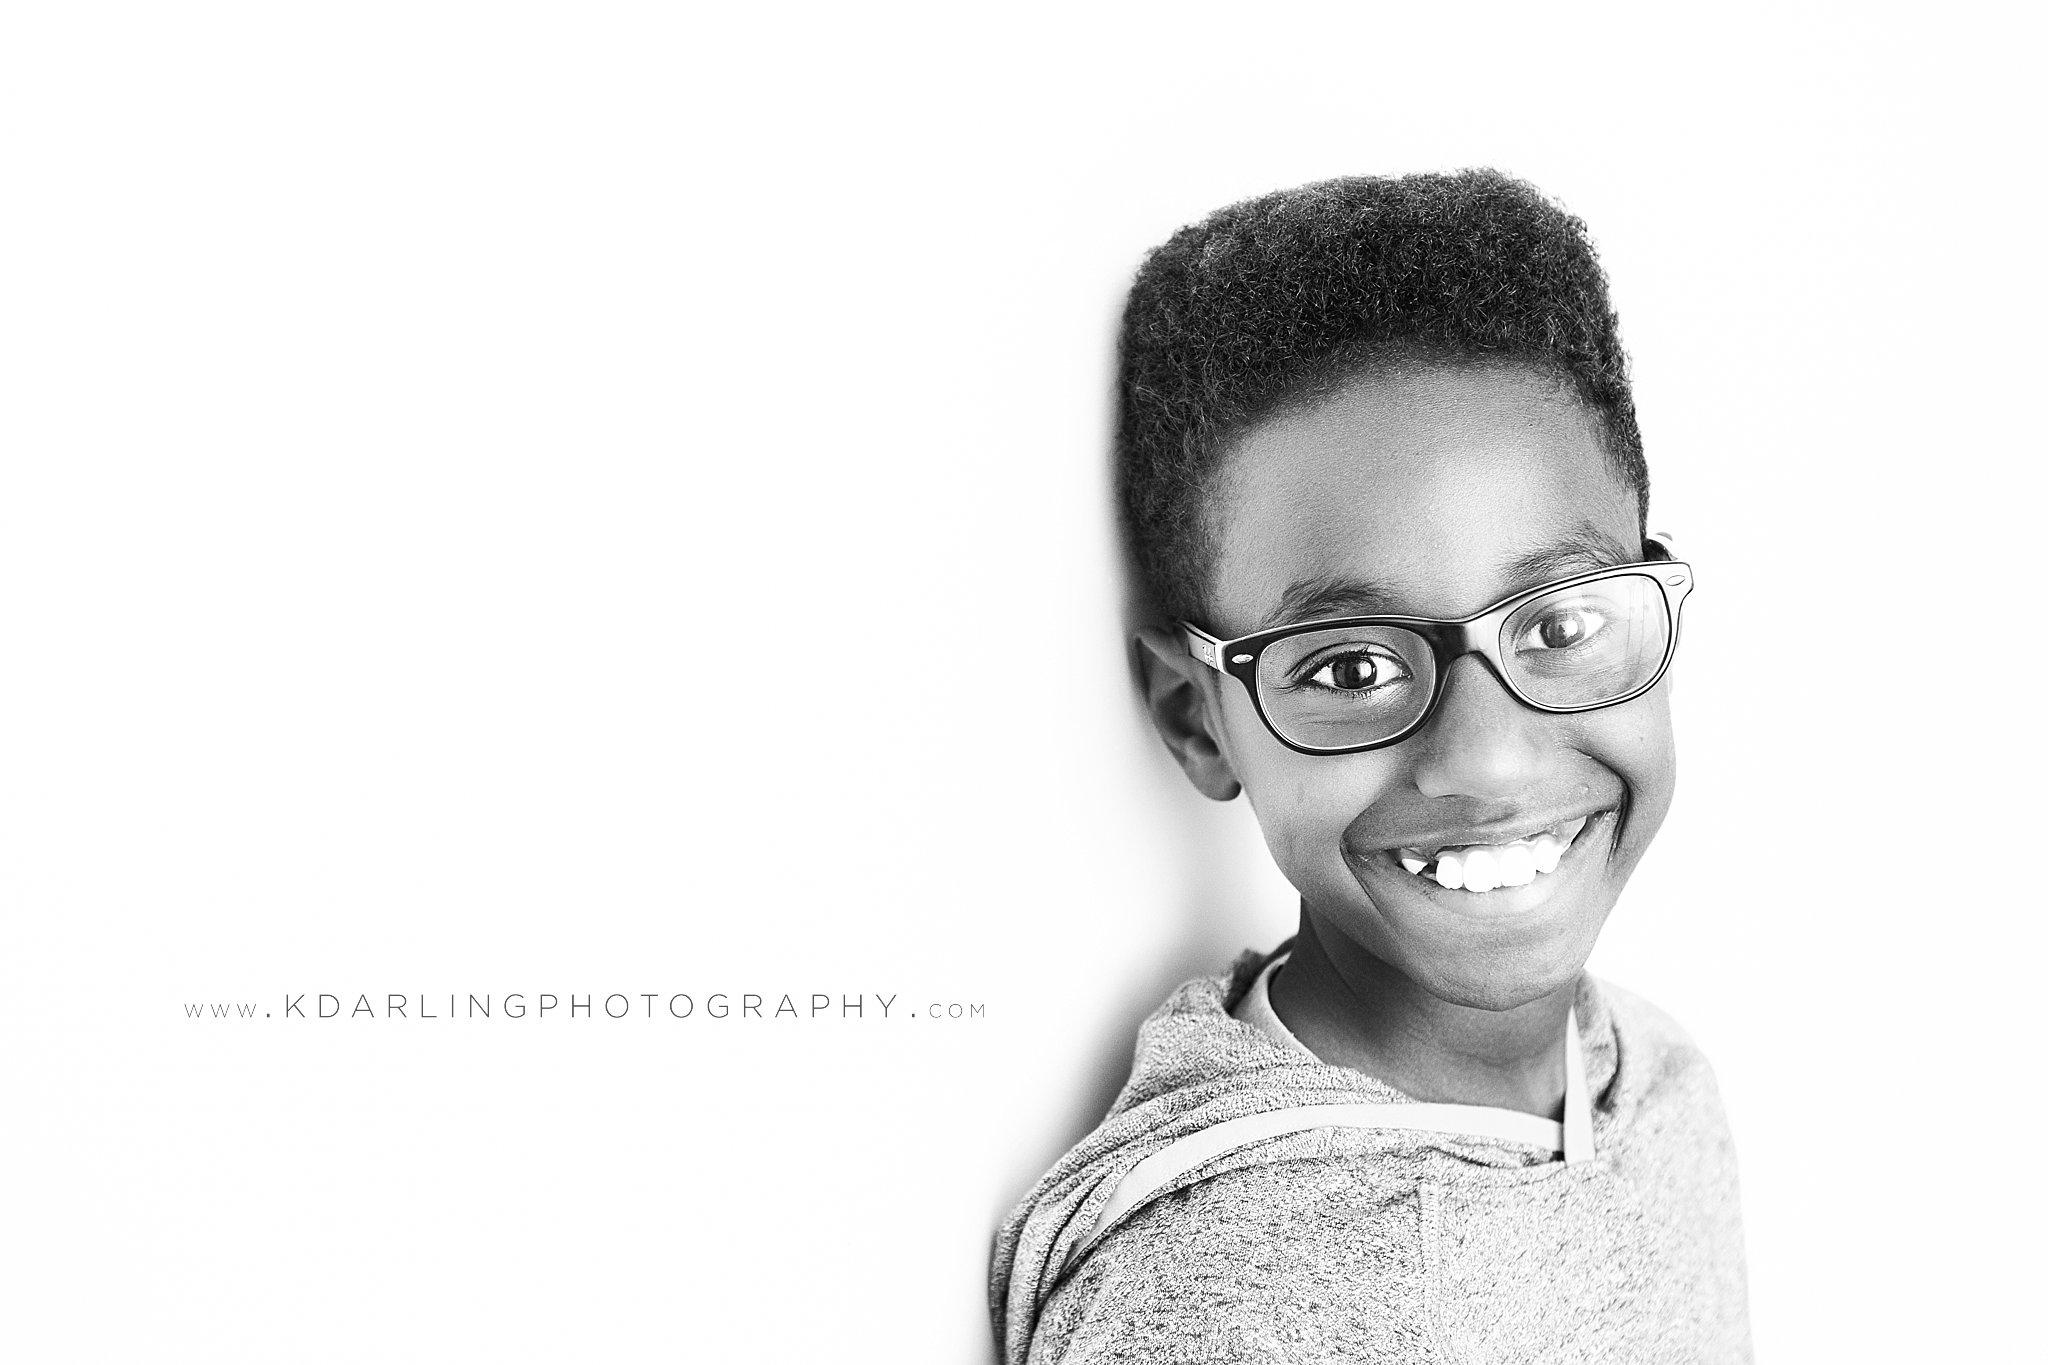 Child-Photographer-portraits-Champaign-County-IL-Fisher-Studio-Darling_0170.jpg